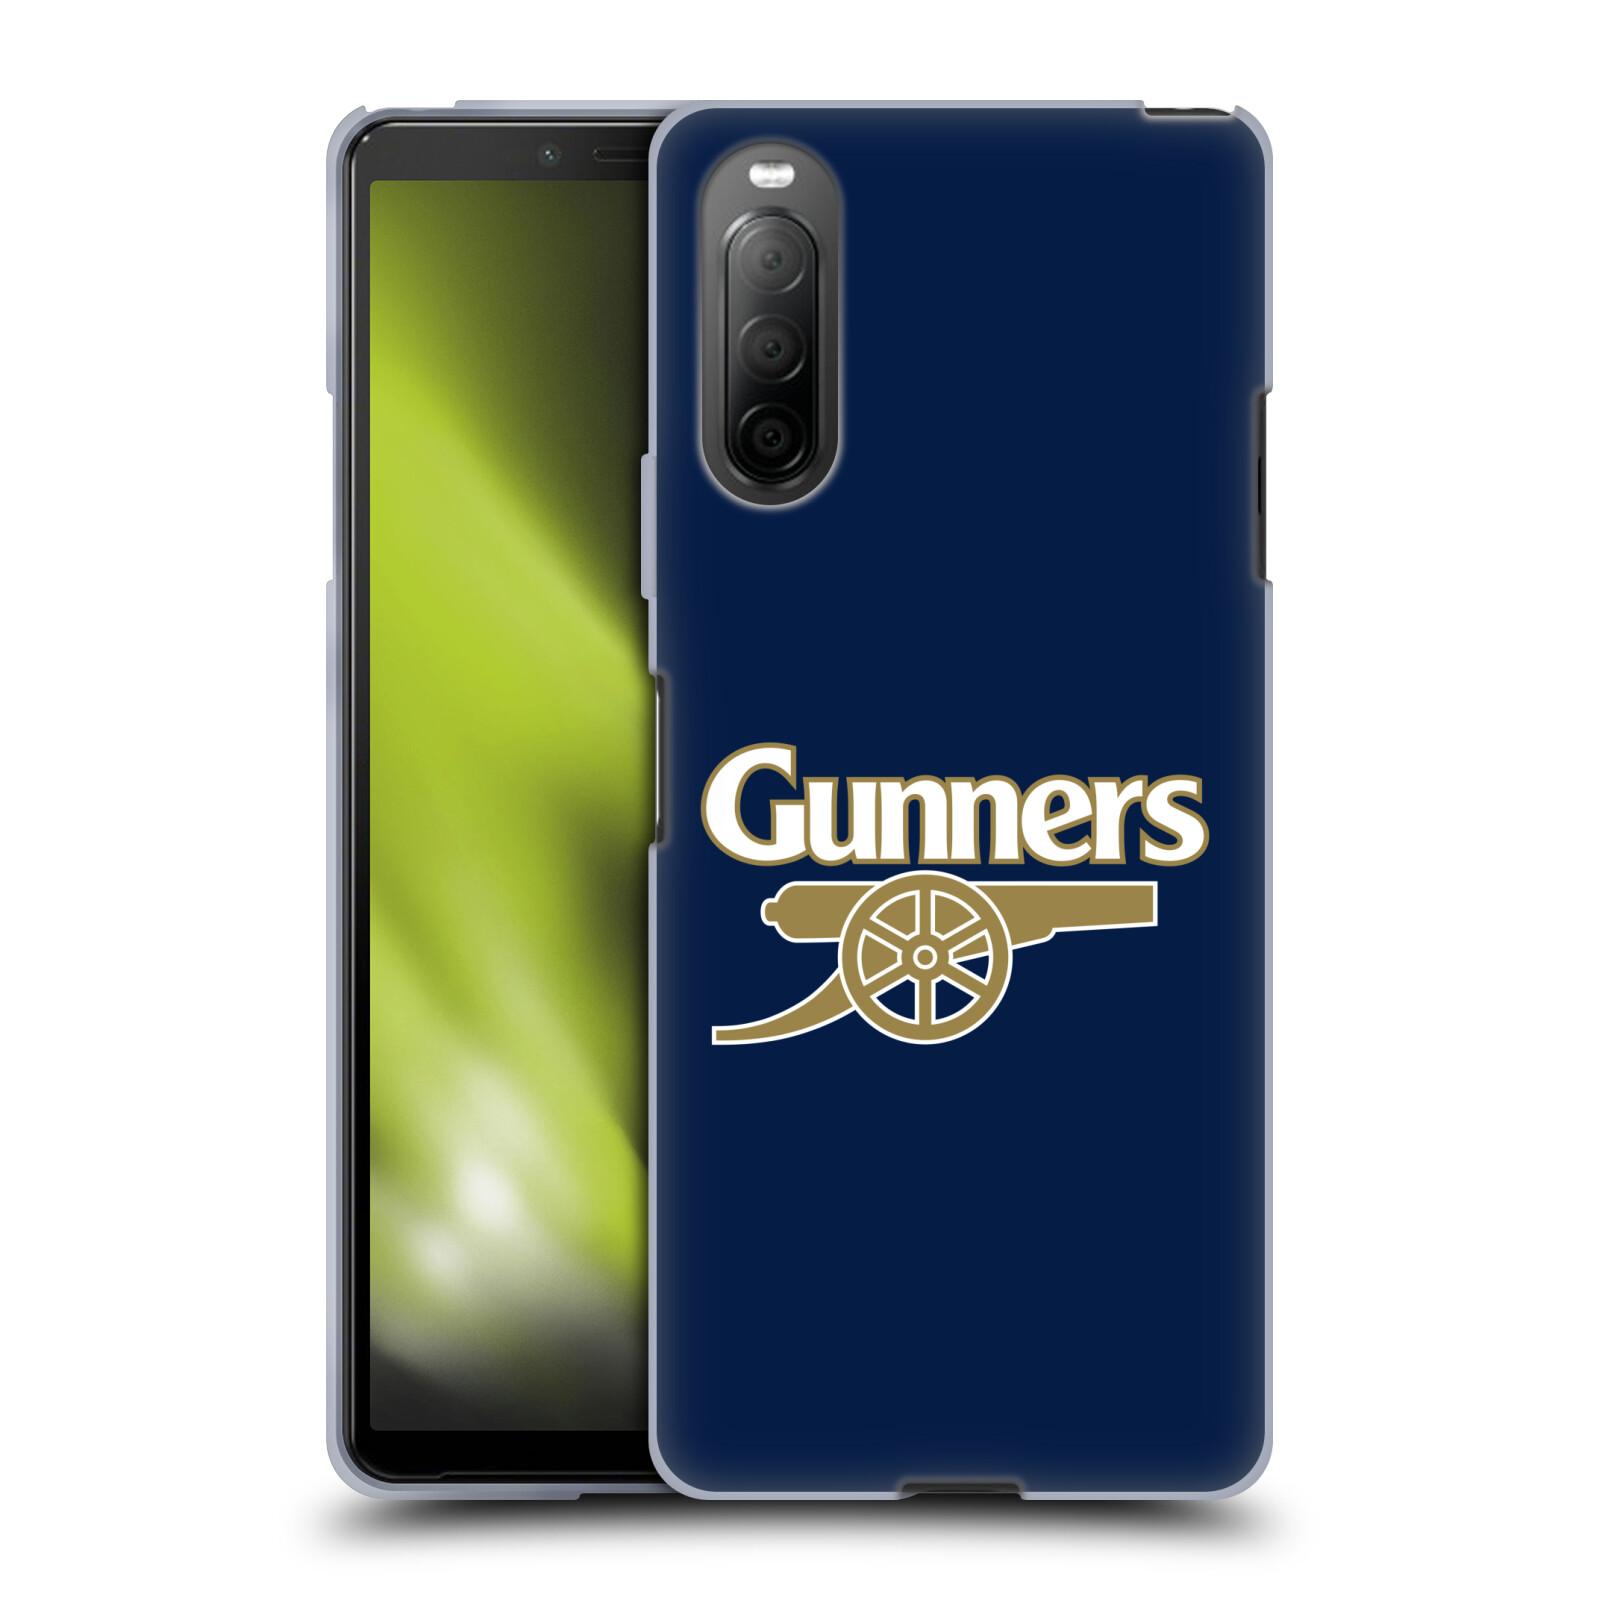 Silikonové pouzdro na mobil Sony Xperia 10 II - Head Case - Arsenal FC - Gunners